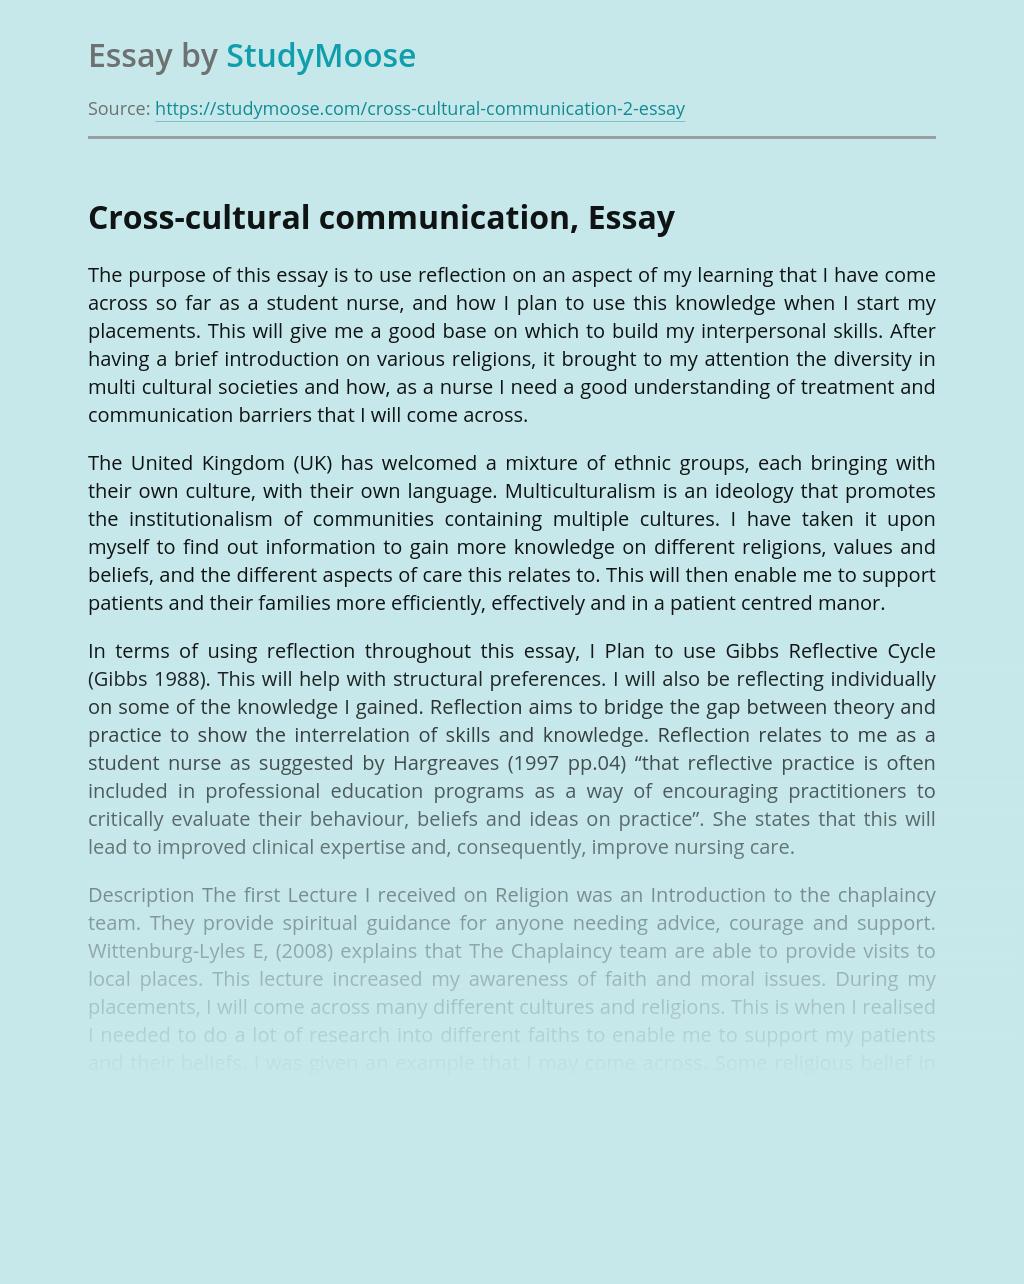 Cross-cultural communication,